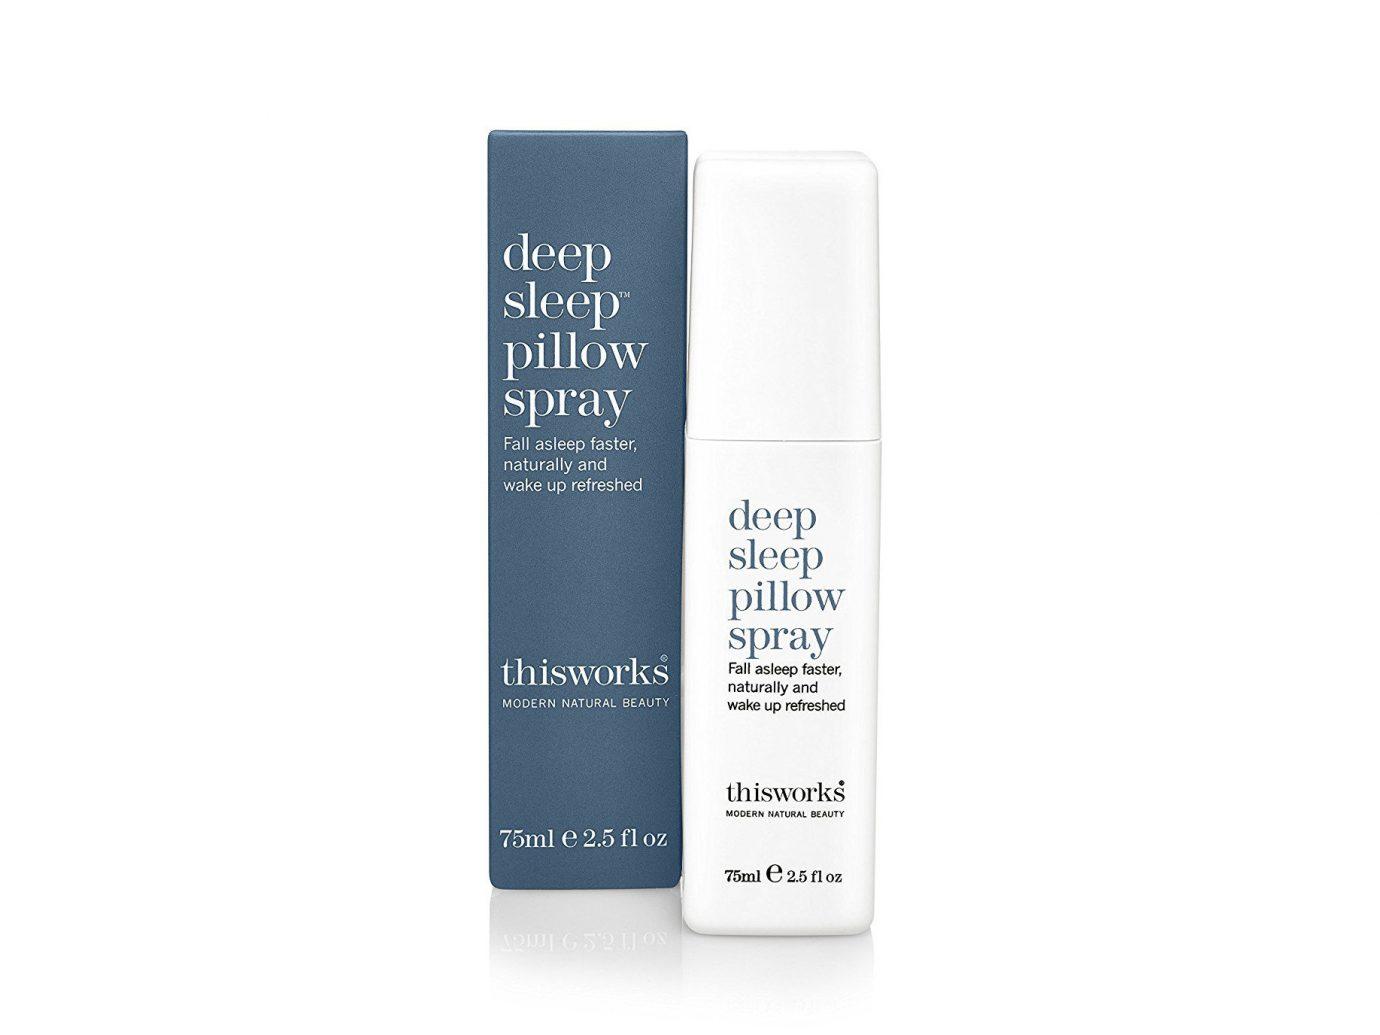 Health + Wellness Travel Tips toiletry skin product lotion cream brand hand skin care eye eyelash